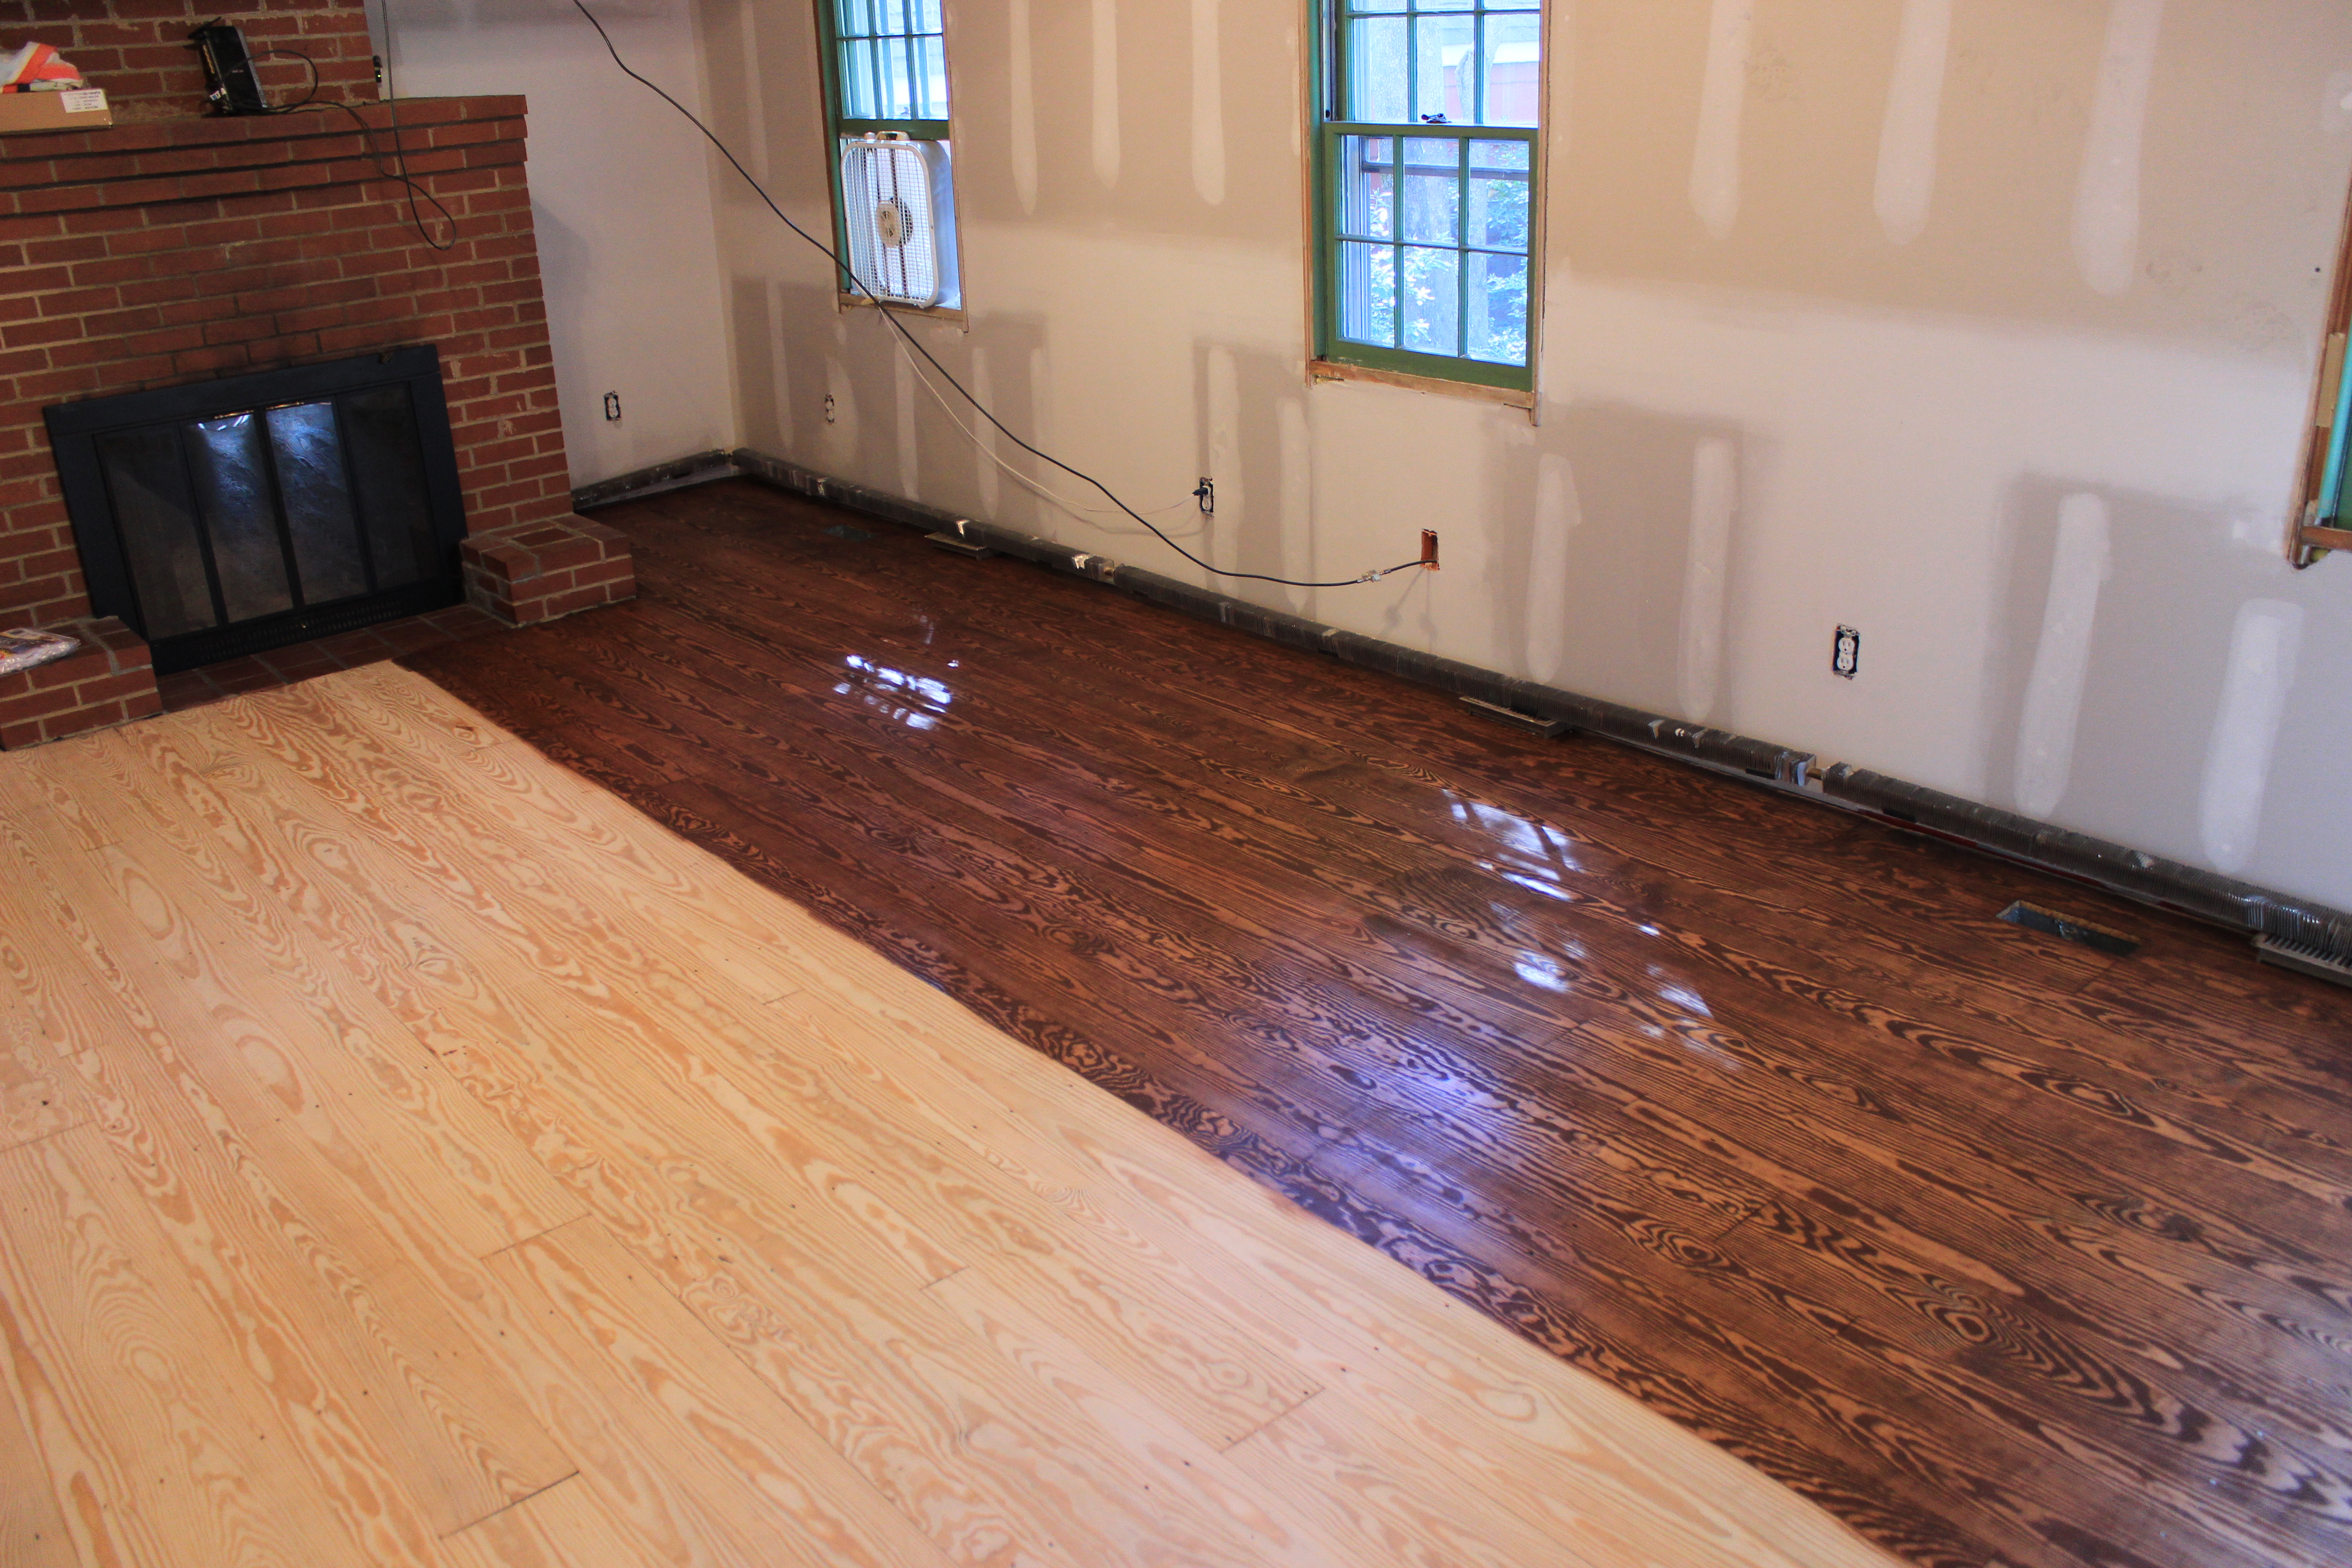 Lovely Home Improvement – The Whole Damn House UB23